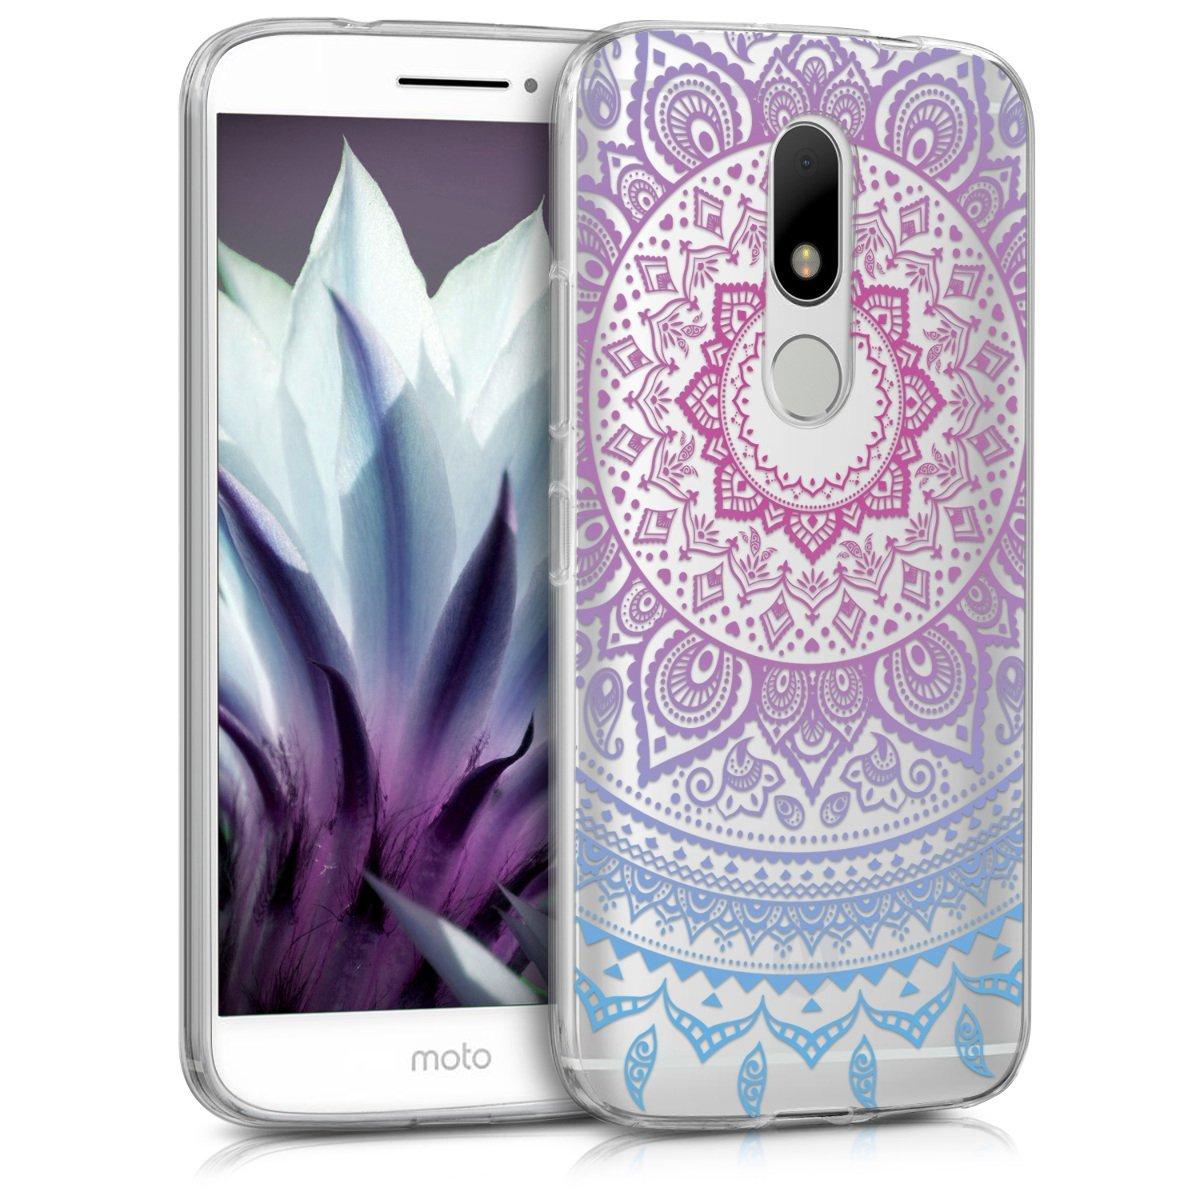 KW Θήκη Σιλικόνης Motorola Moto M - Blue Dark/ Pink Indian Sun (40648.01)